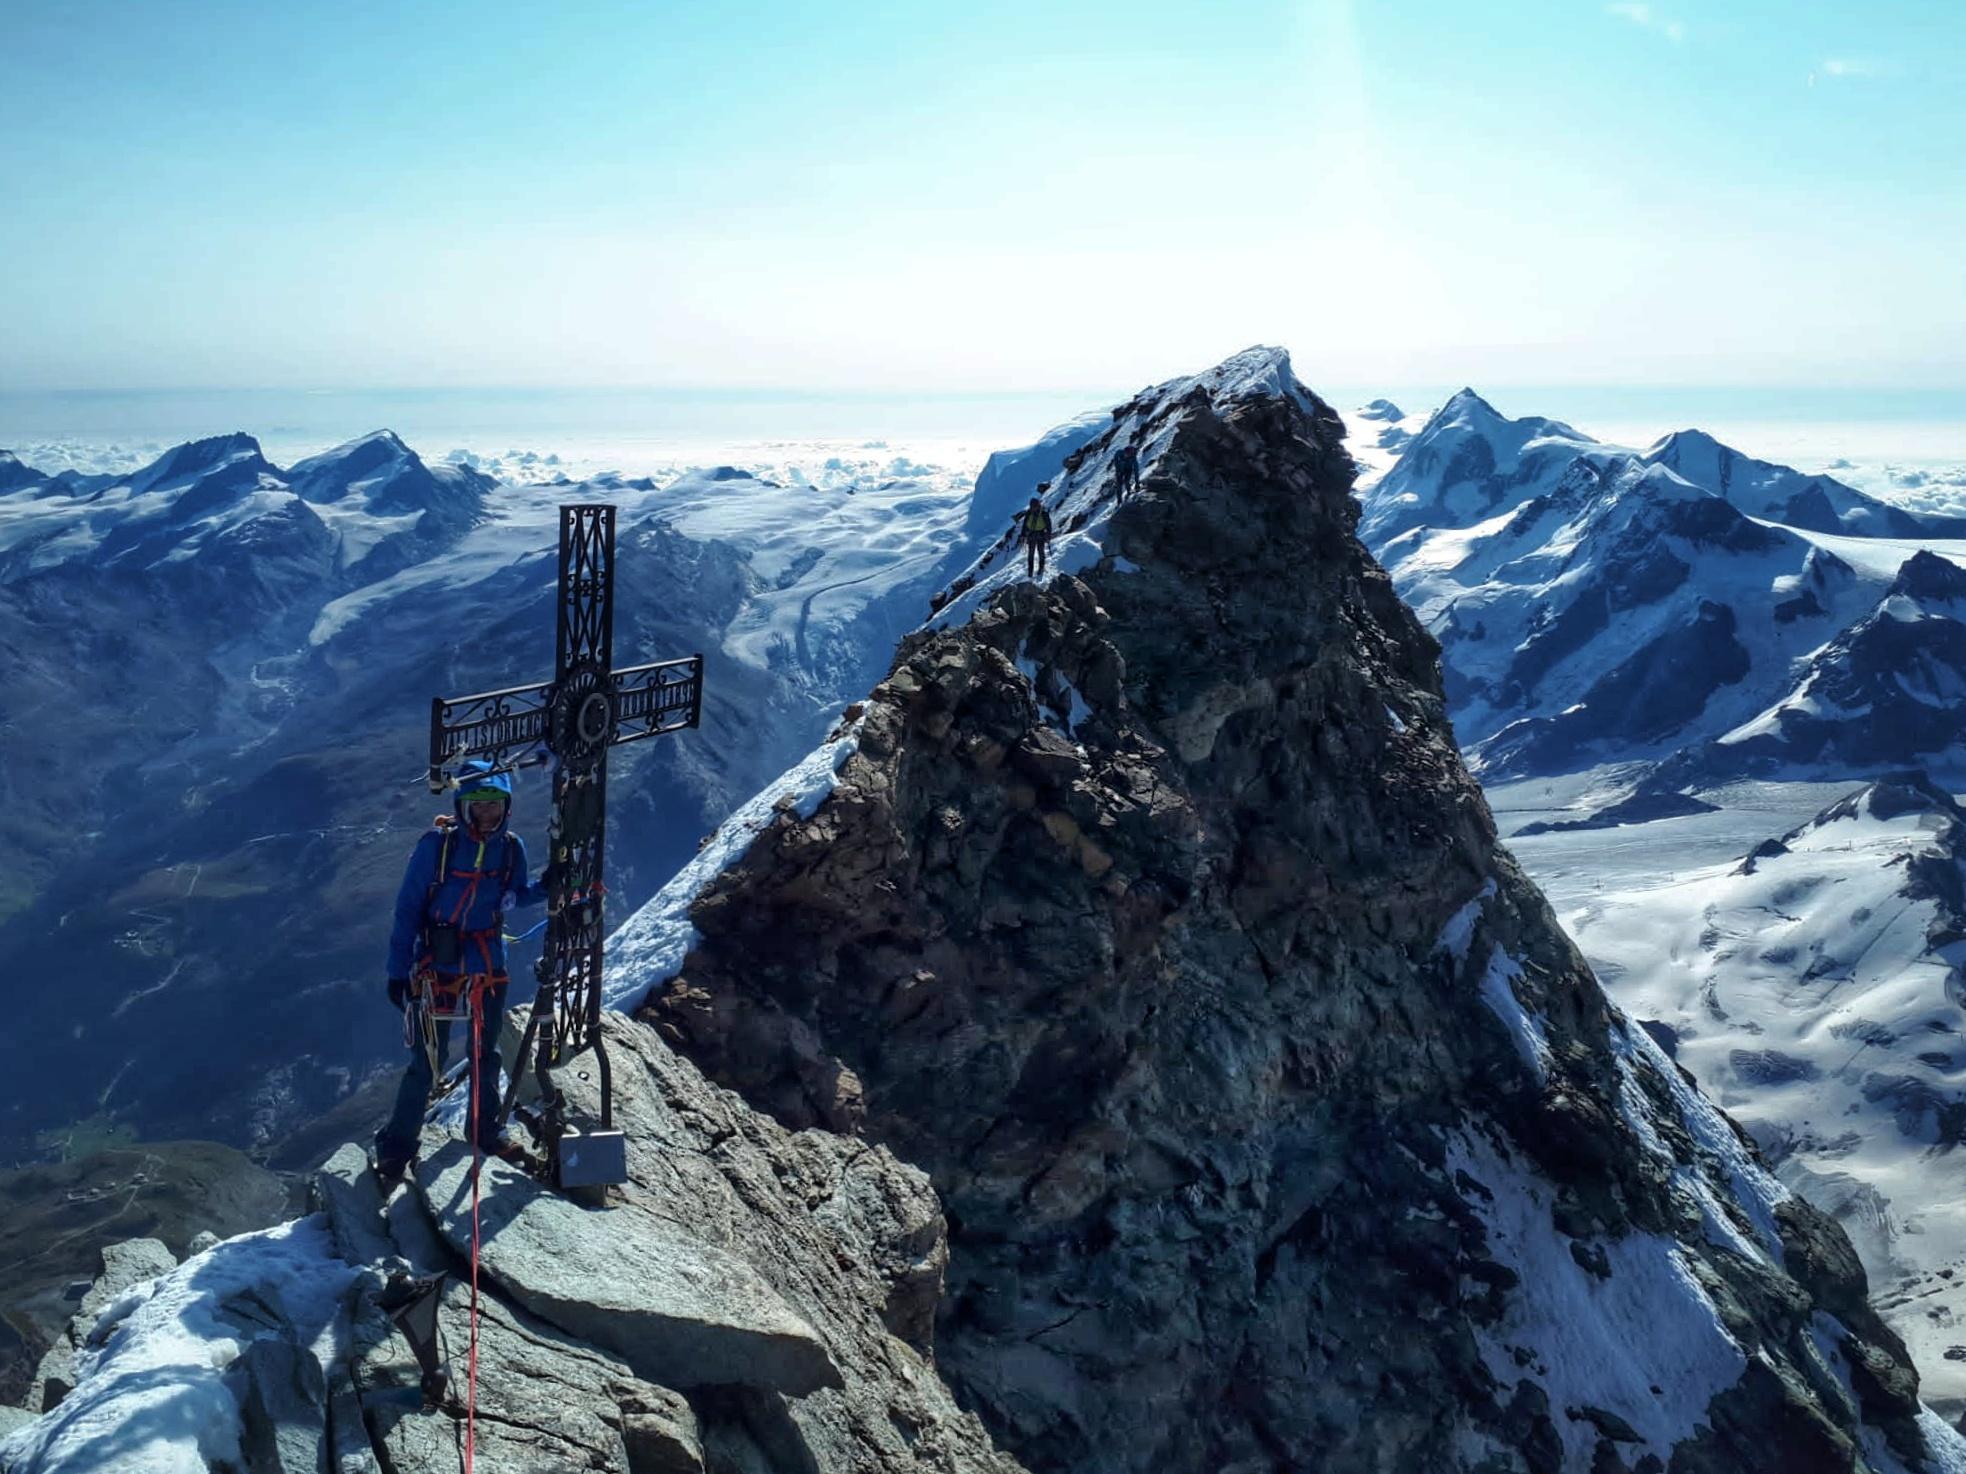 Matterhorne peak